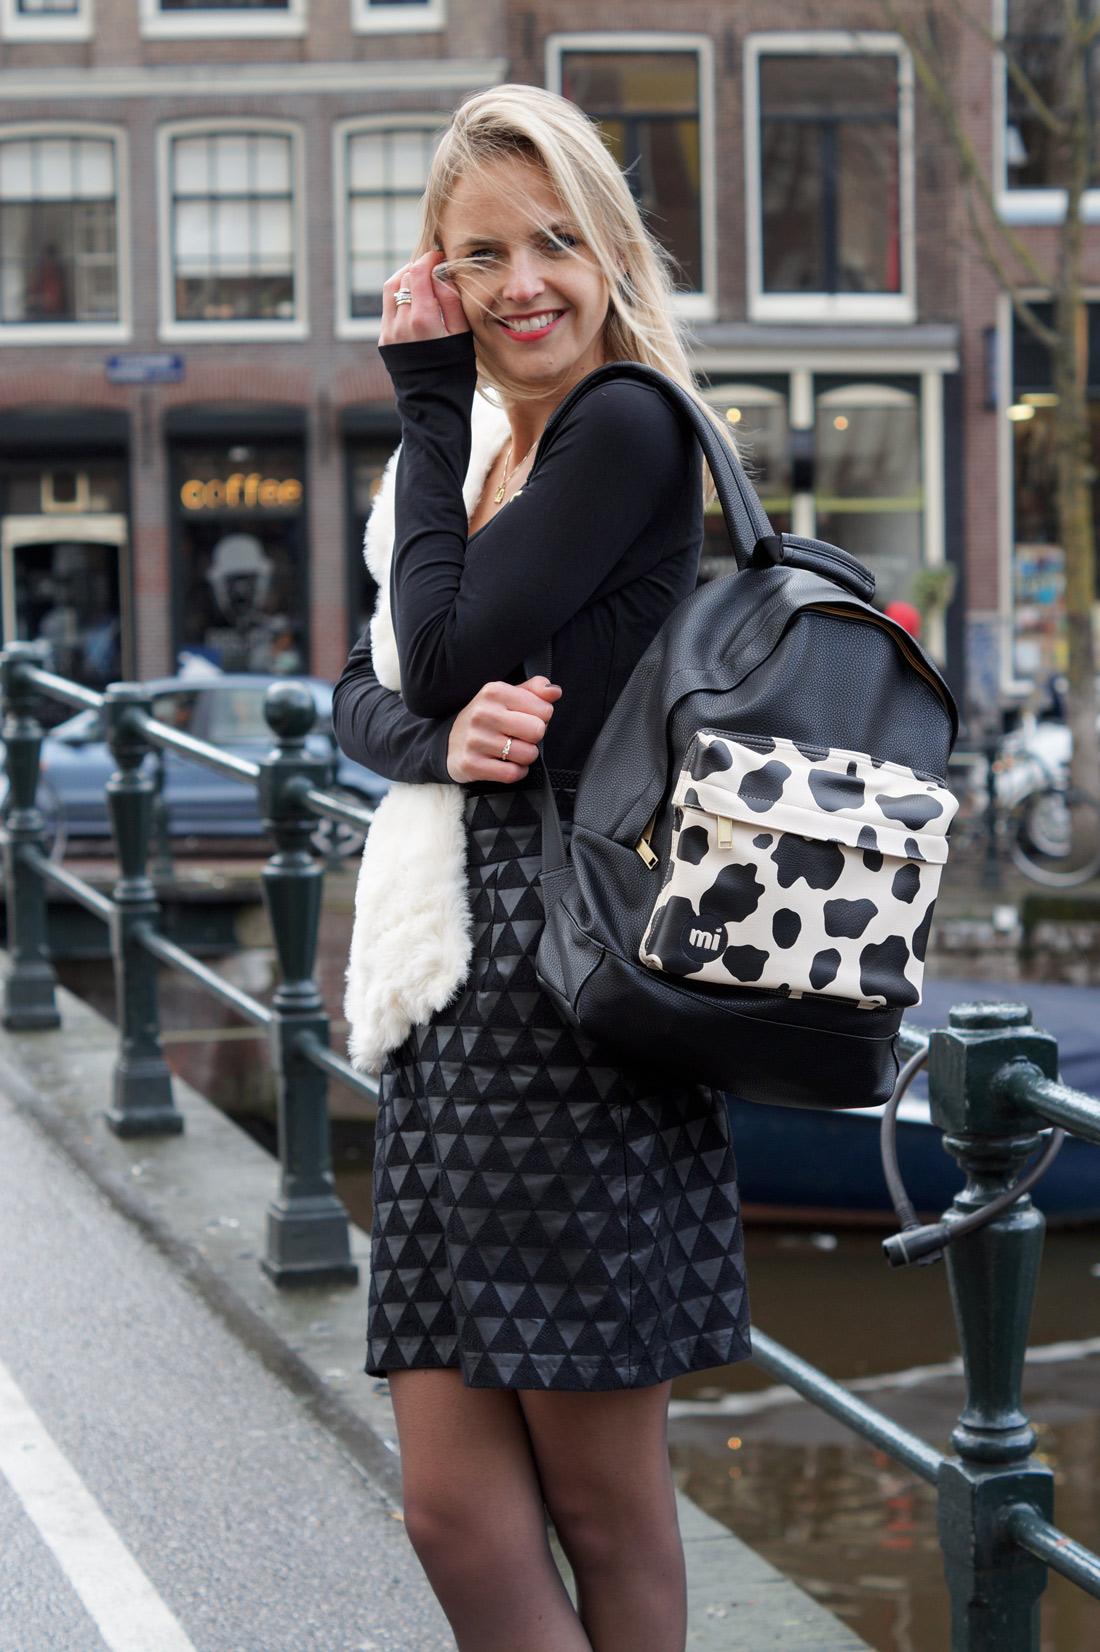 Bag-at-You---Fashion-blog---Mi-Pac-label-bags---Dutch-blogger-Amsterdam